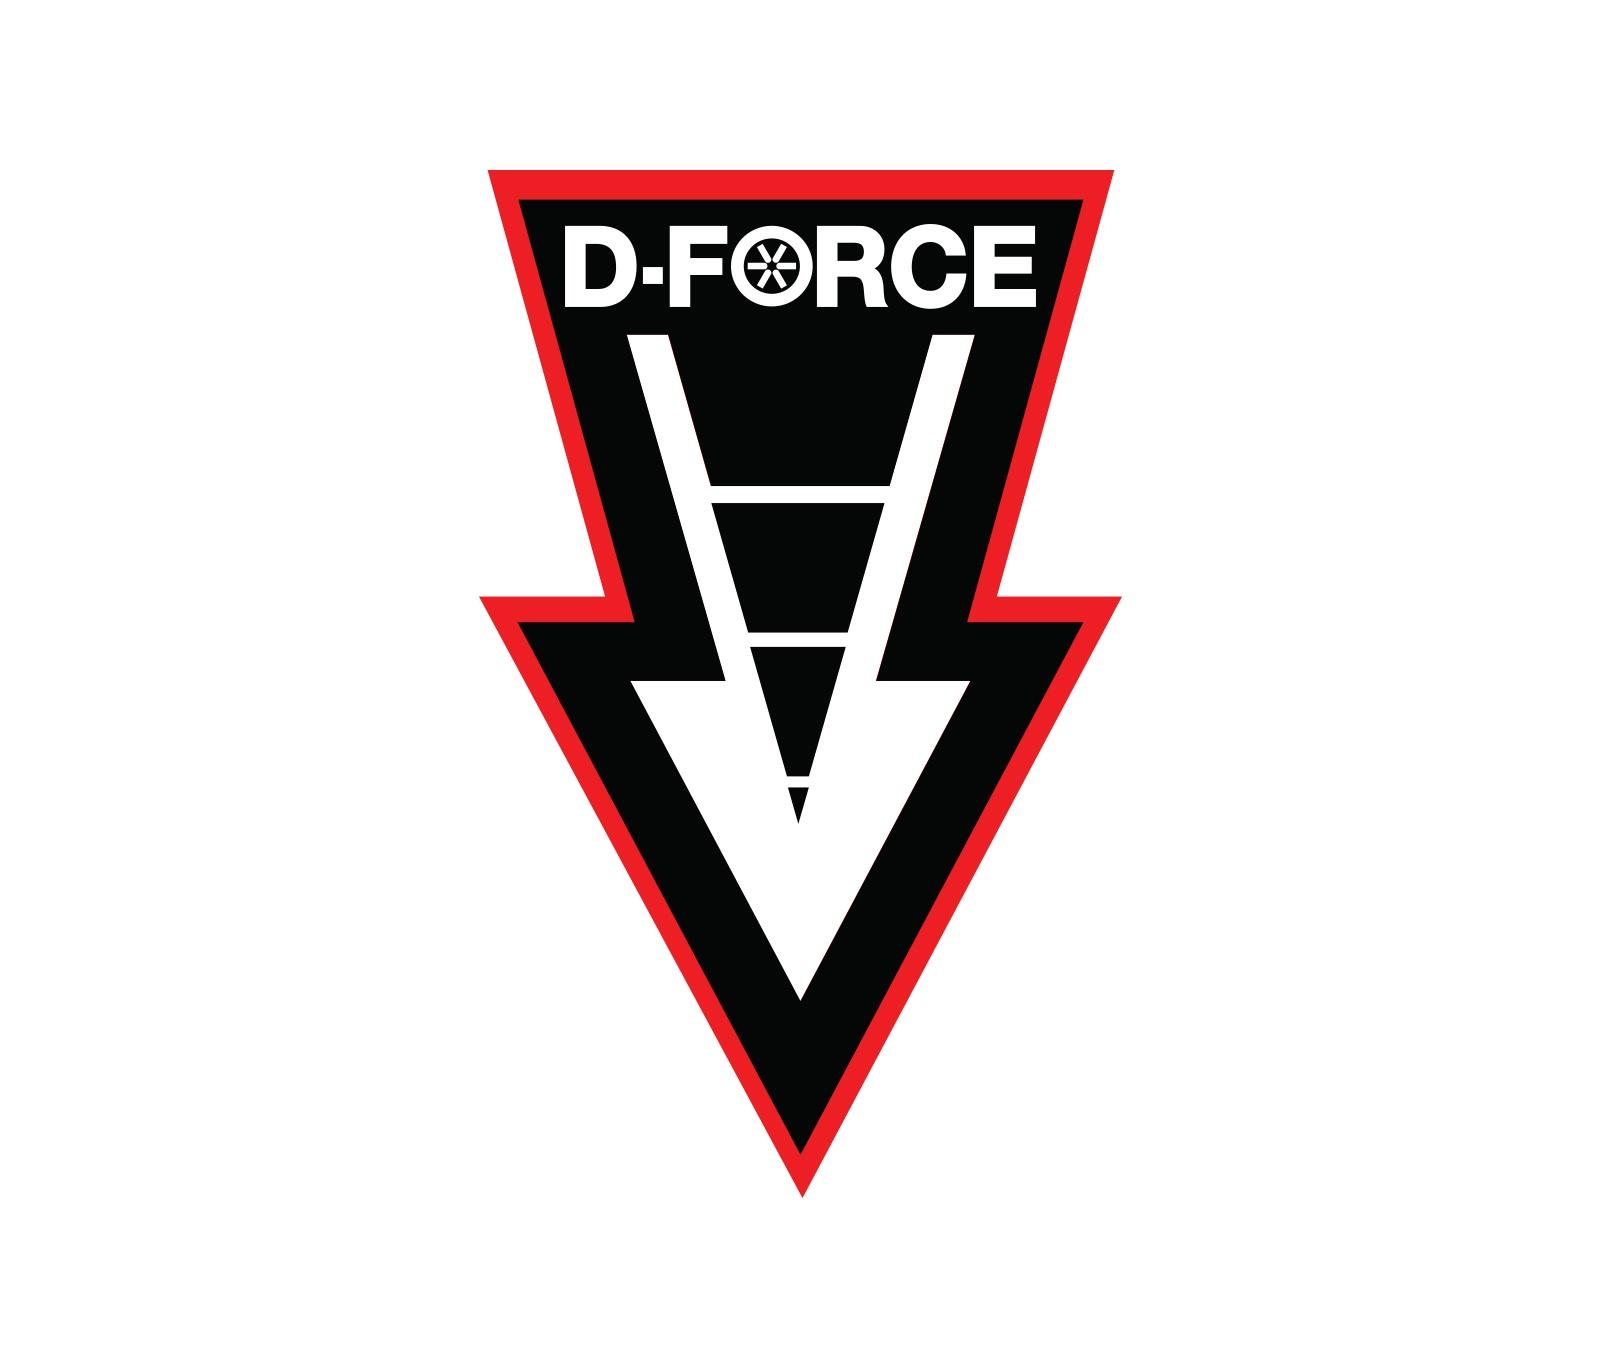 D-force_Logo.jpg